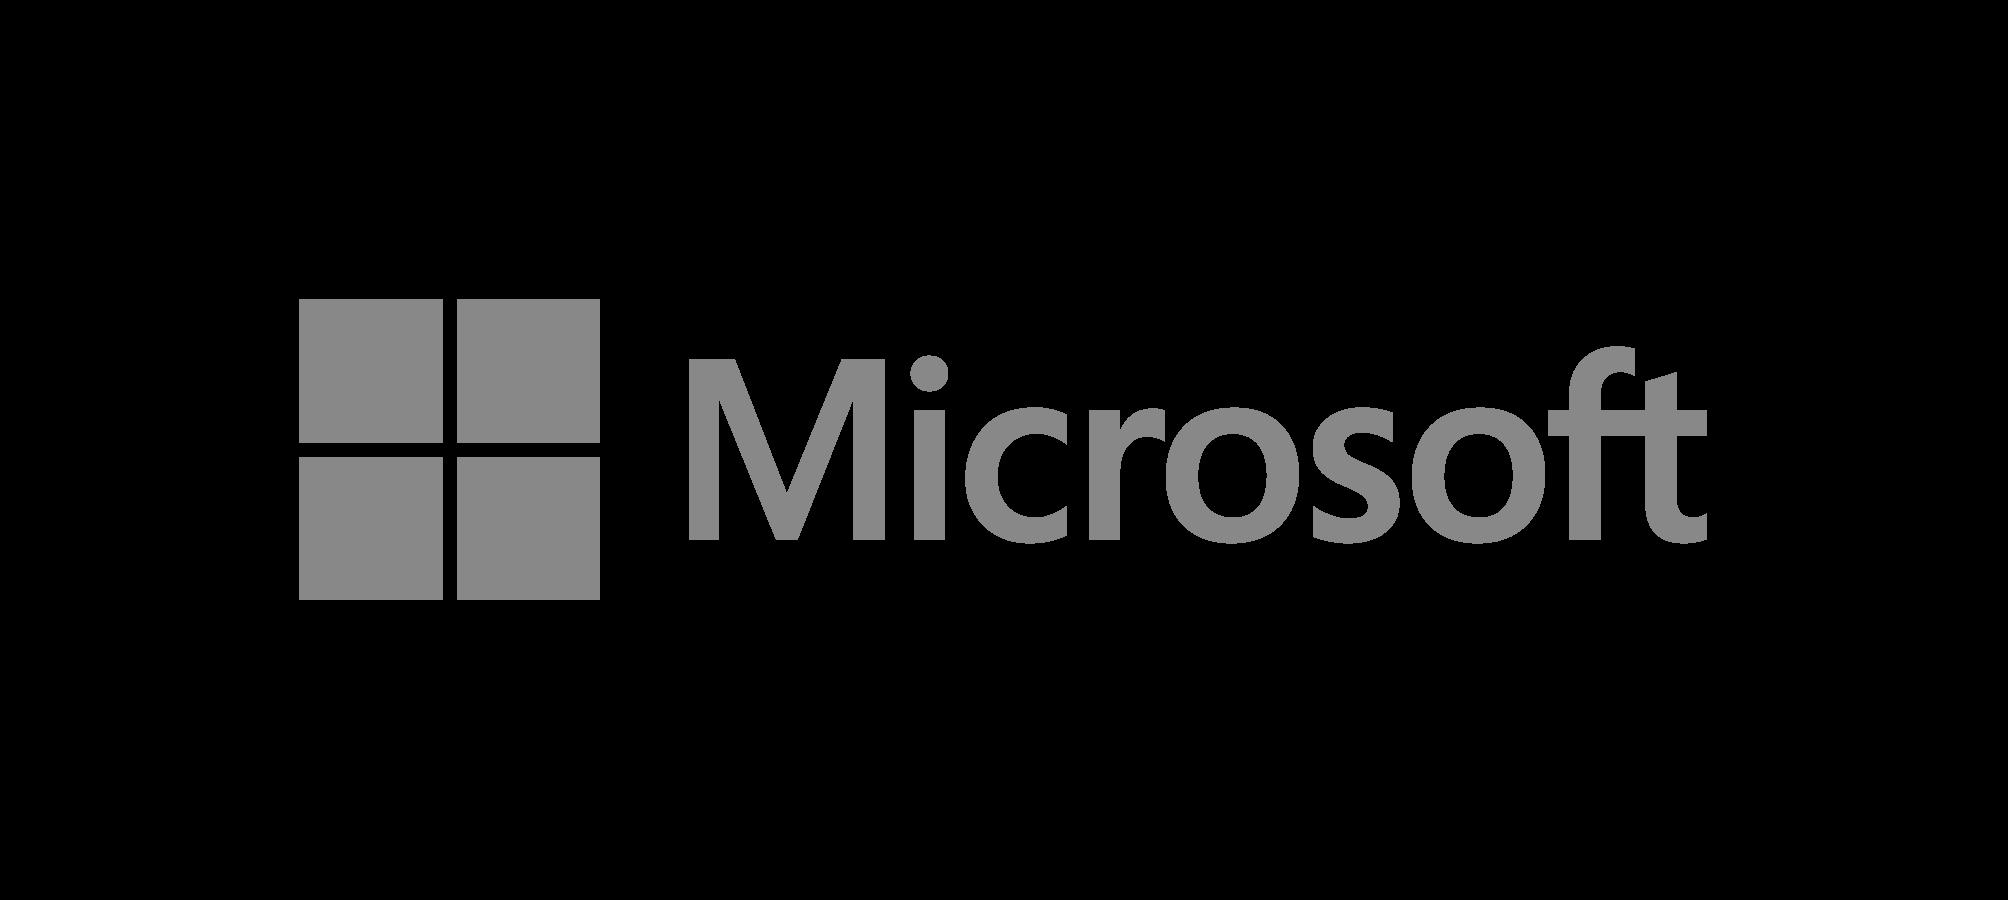 Microsoft-logo_grey_web